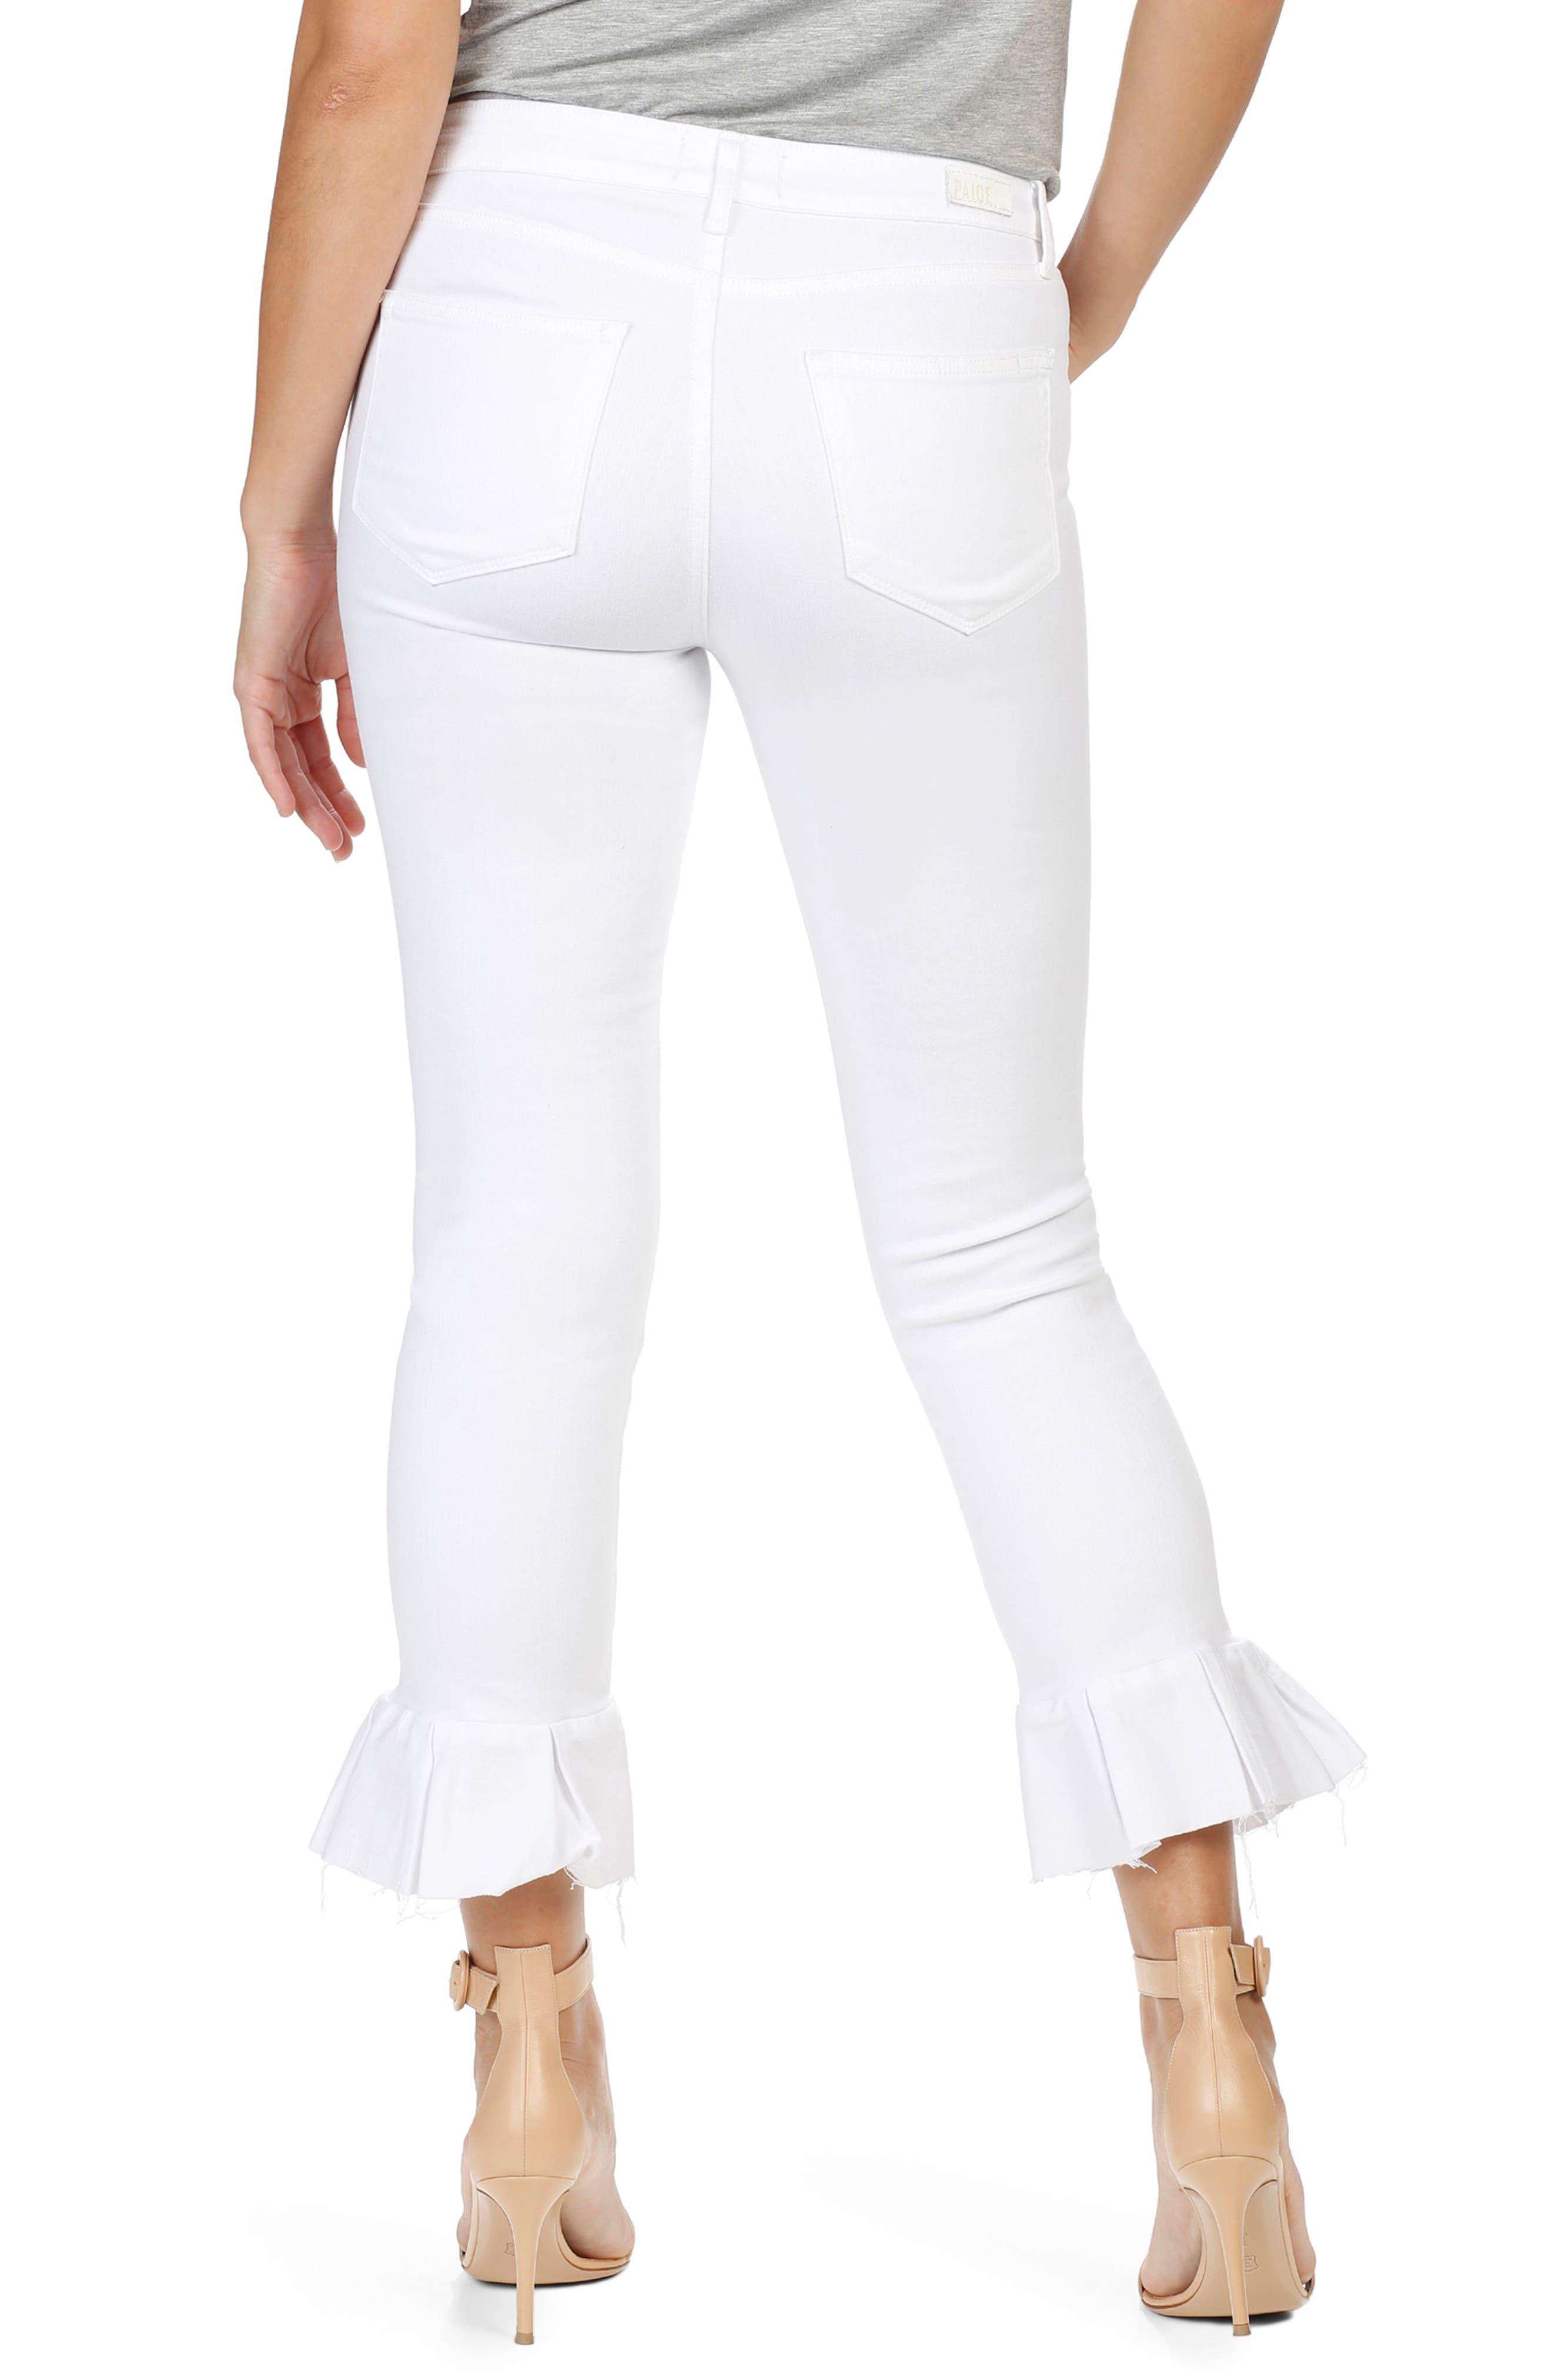 Alternate Image 3  - PAIGE Rafaela High Waist Raw Hem Ankle Ultra Skinny Jeans (Optic White)